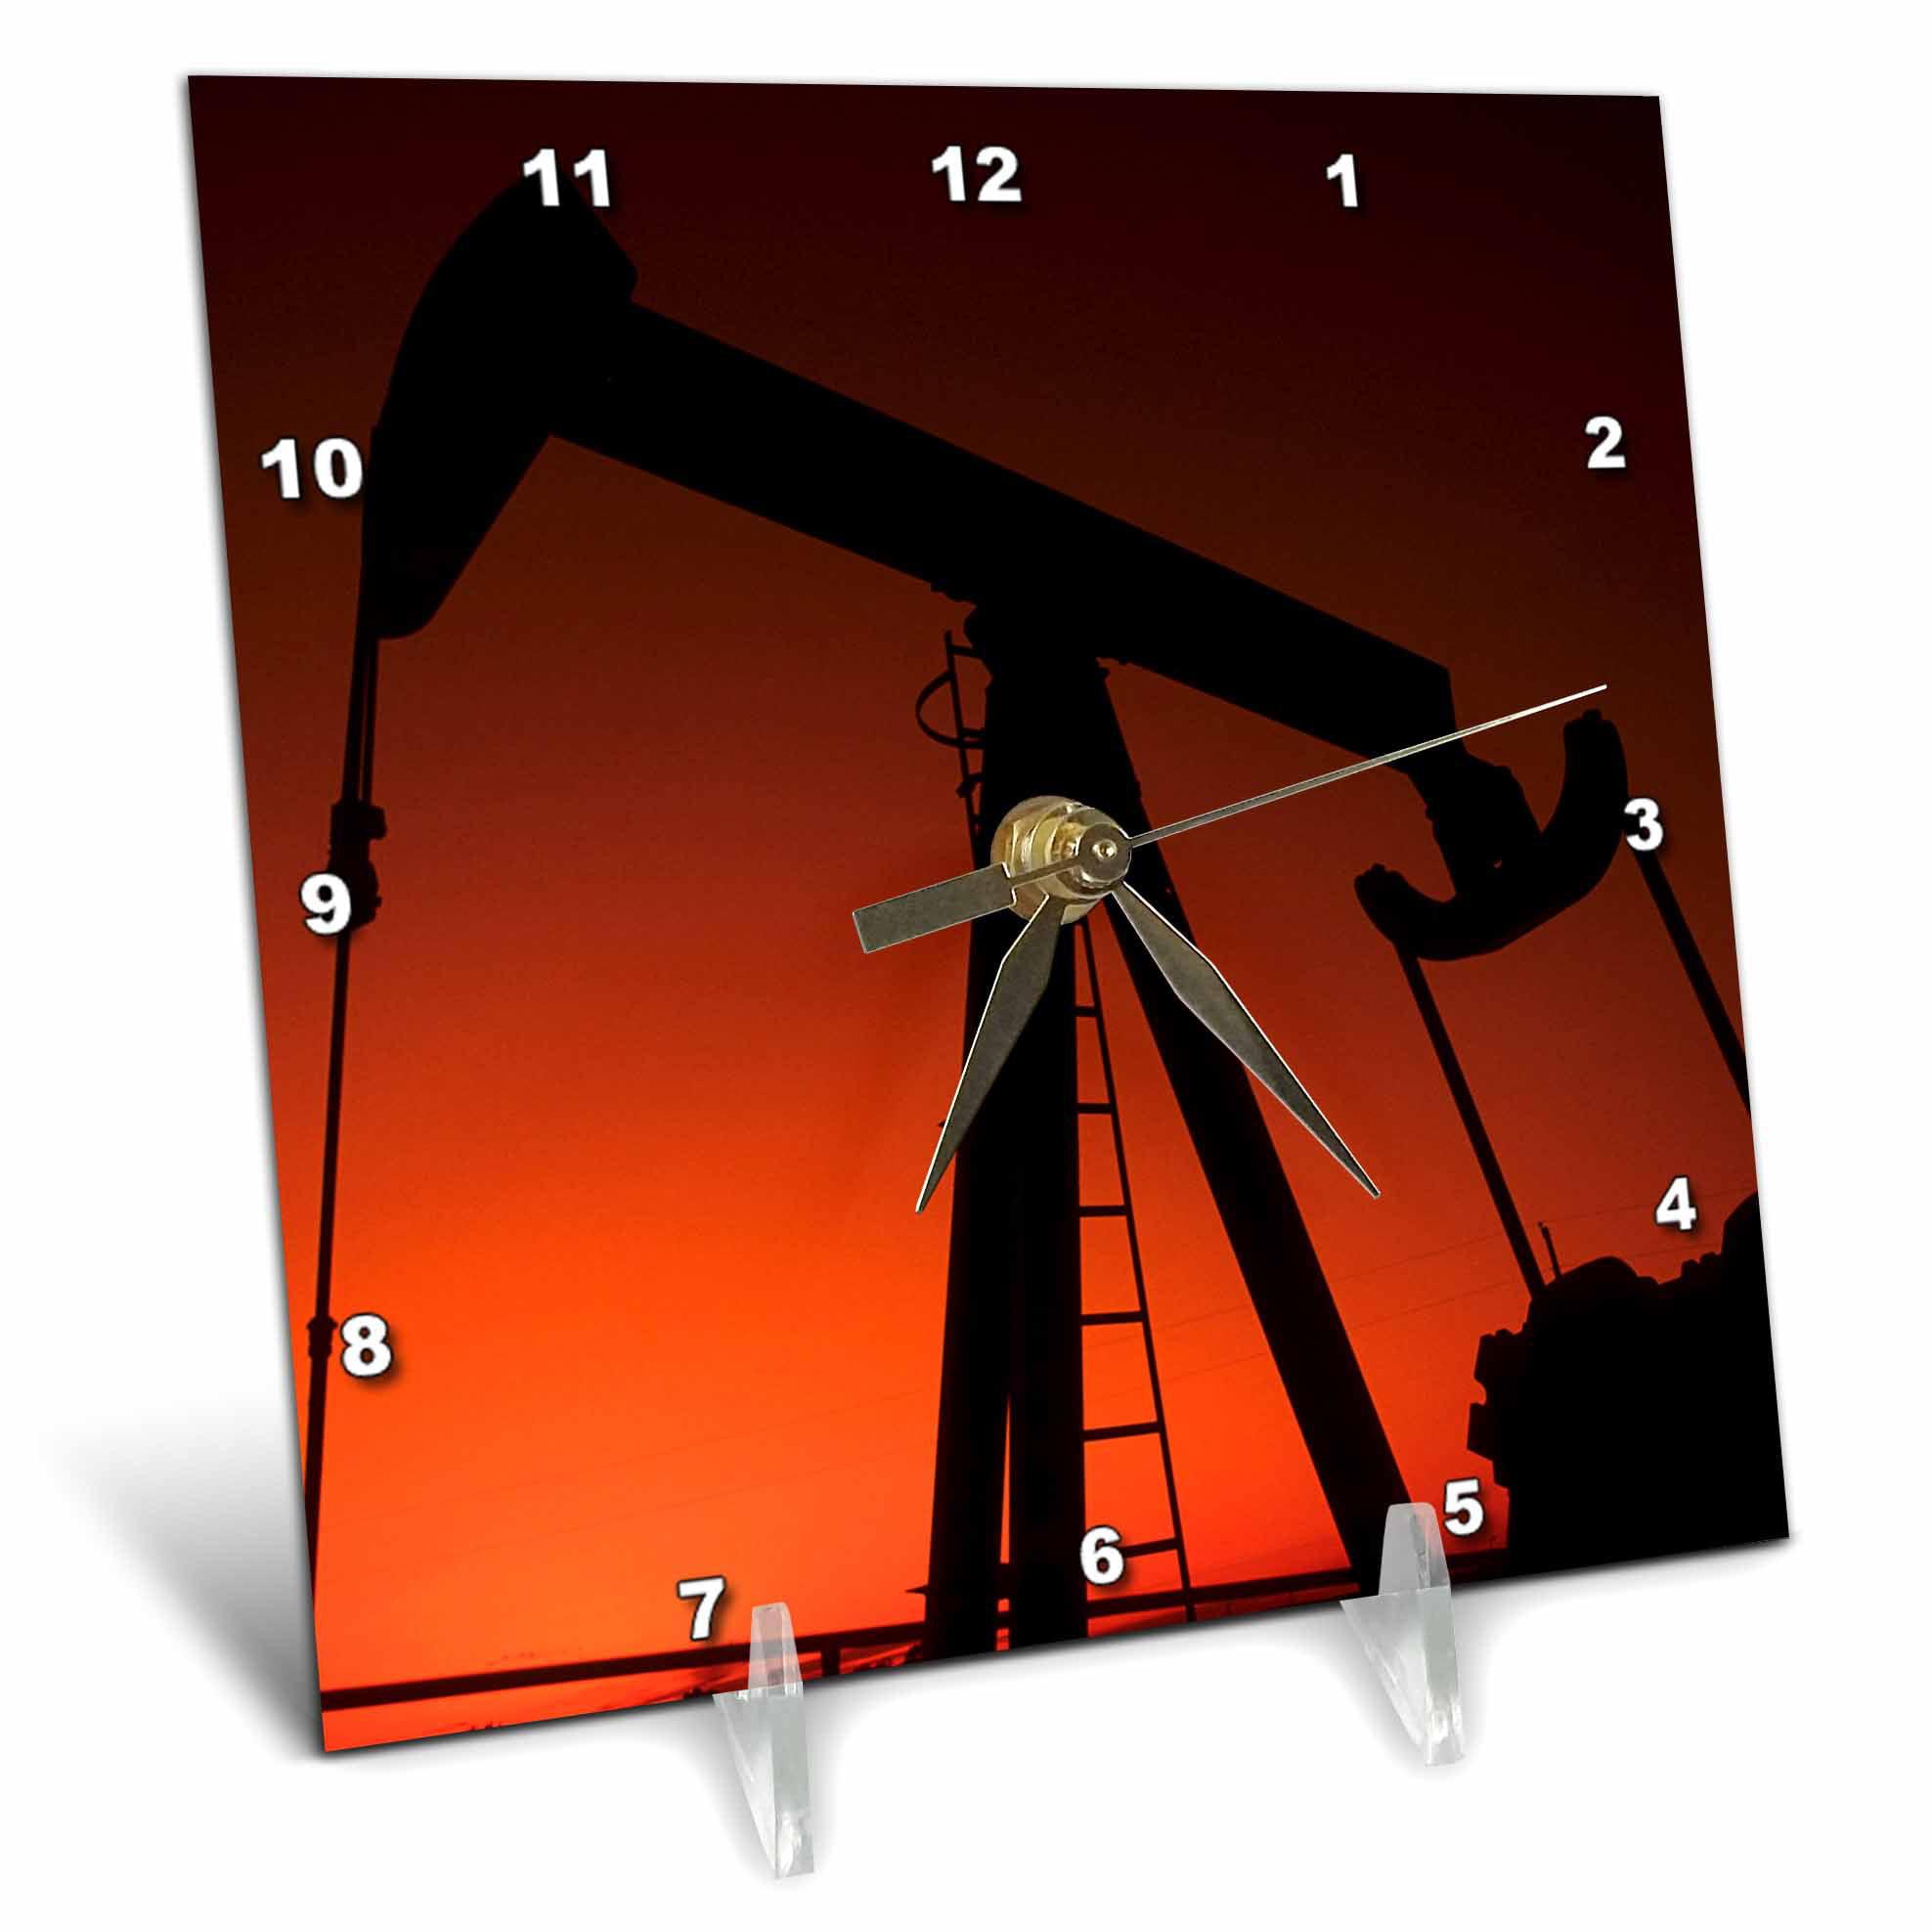 3dRose Industry, Oil rig, Tulsa, Oklahoma US37 BBA0001 Bill Bachmann, Desk Clock, 6 by 6-inch by 3dRose